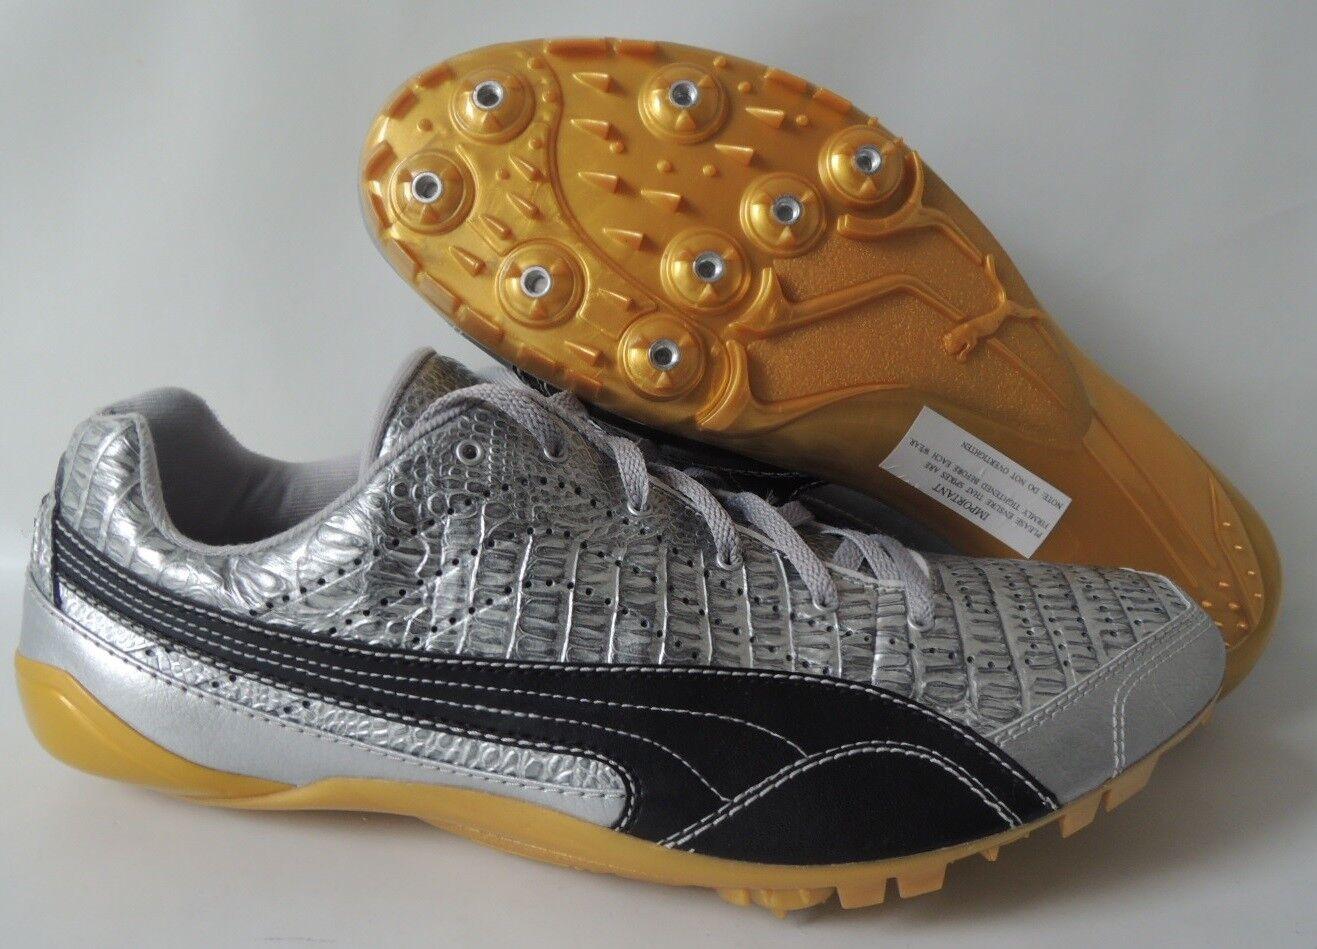 NEU Puma Complete Theseus II Croc Größe 45 45 45 Spikes Spikeschuhe Schuhe 183442-02 3fbc56